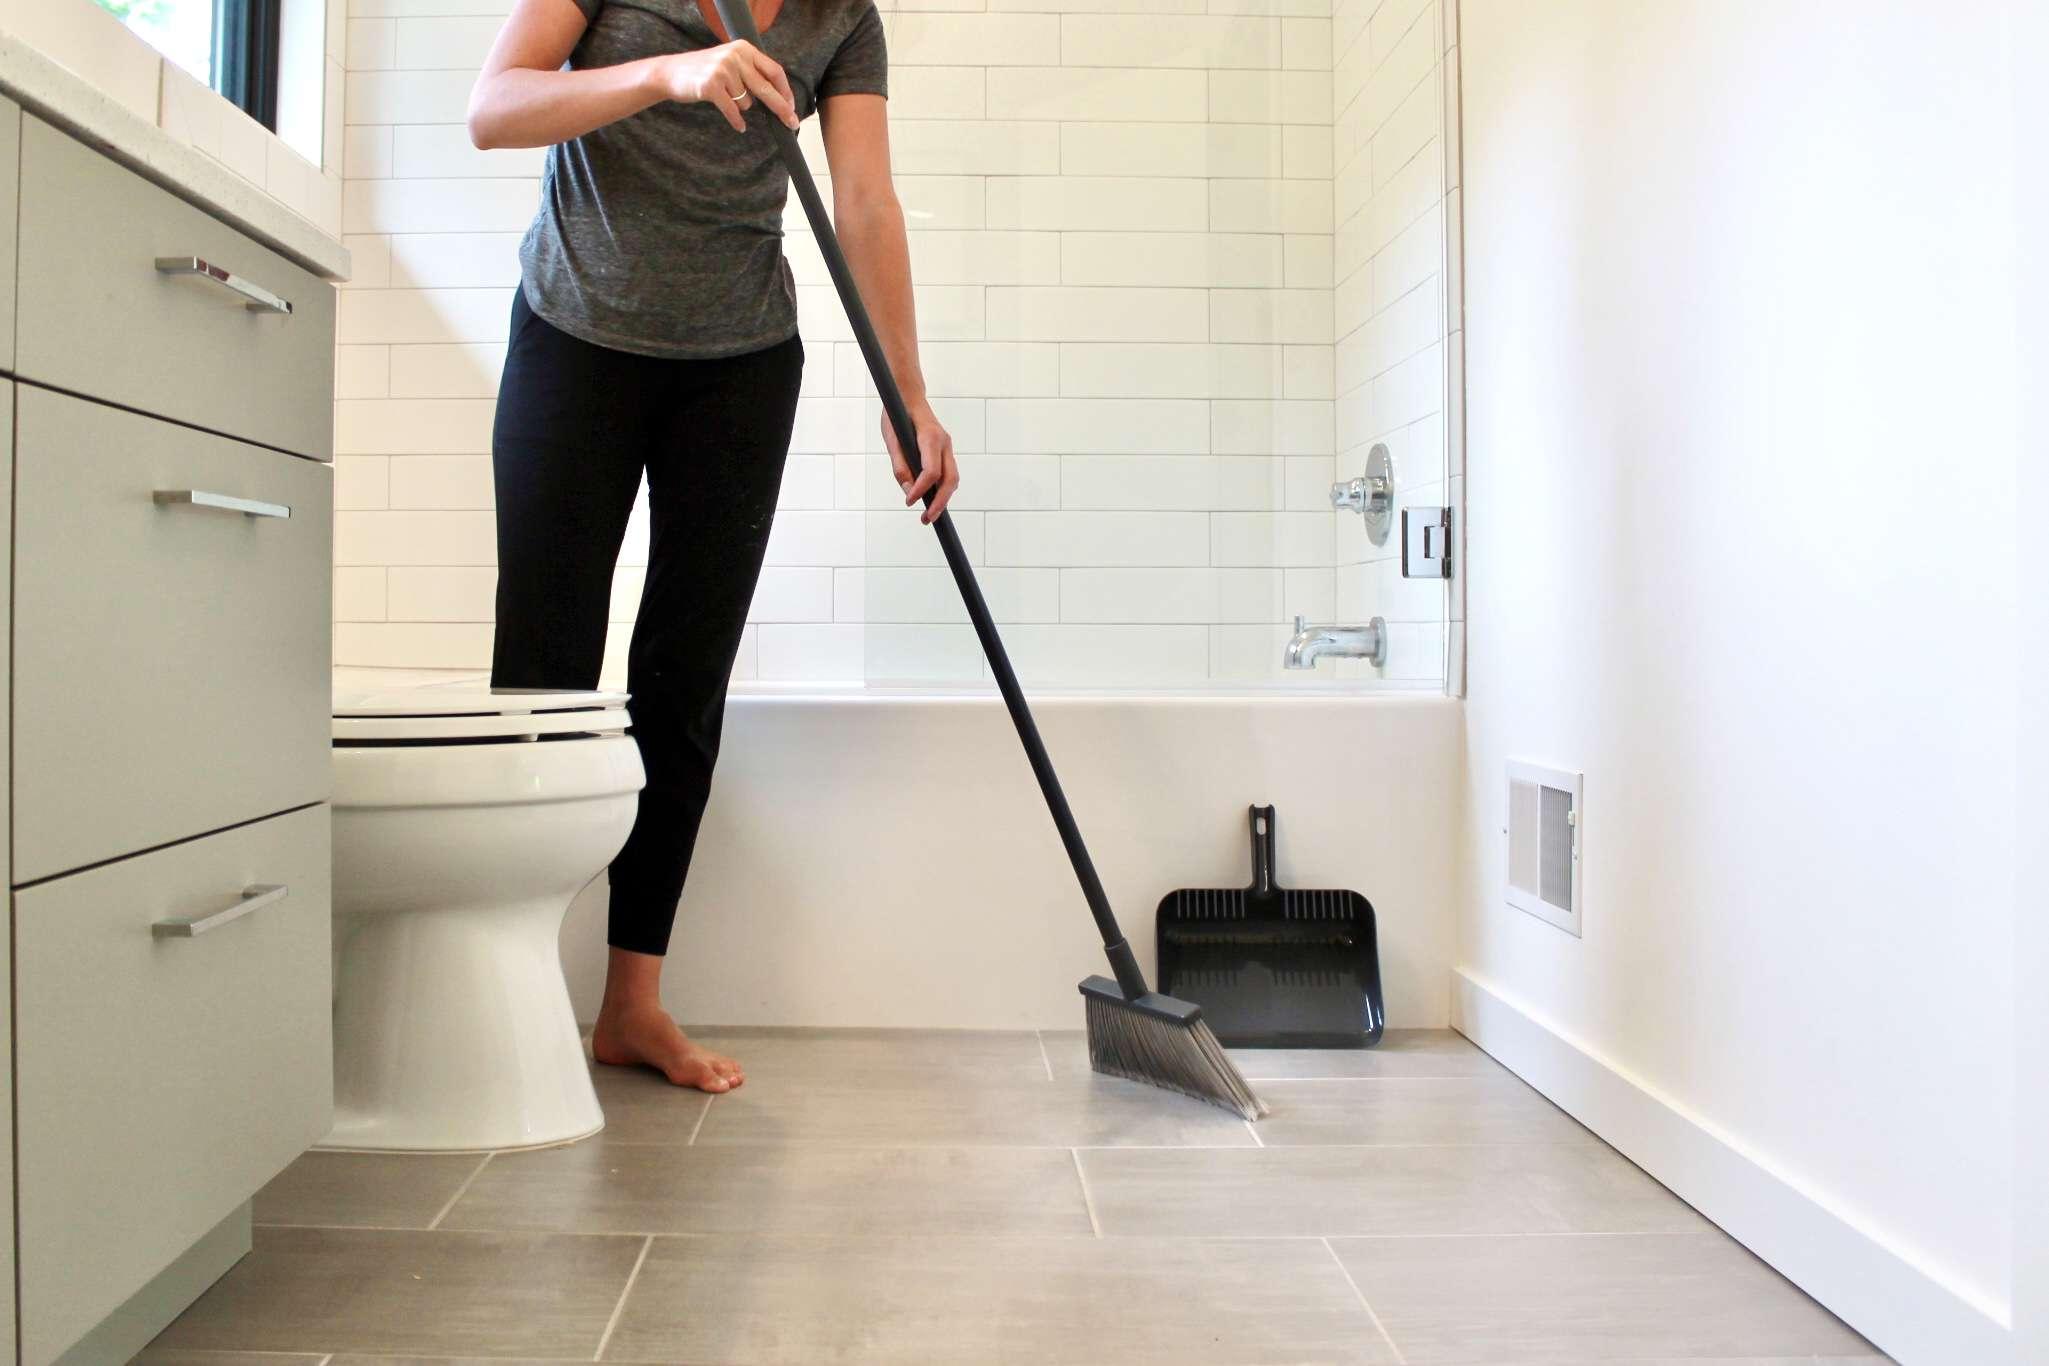 how to clean a floor how to clean a floor